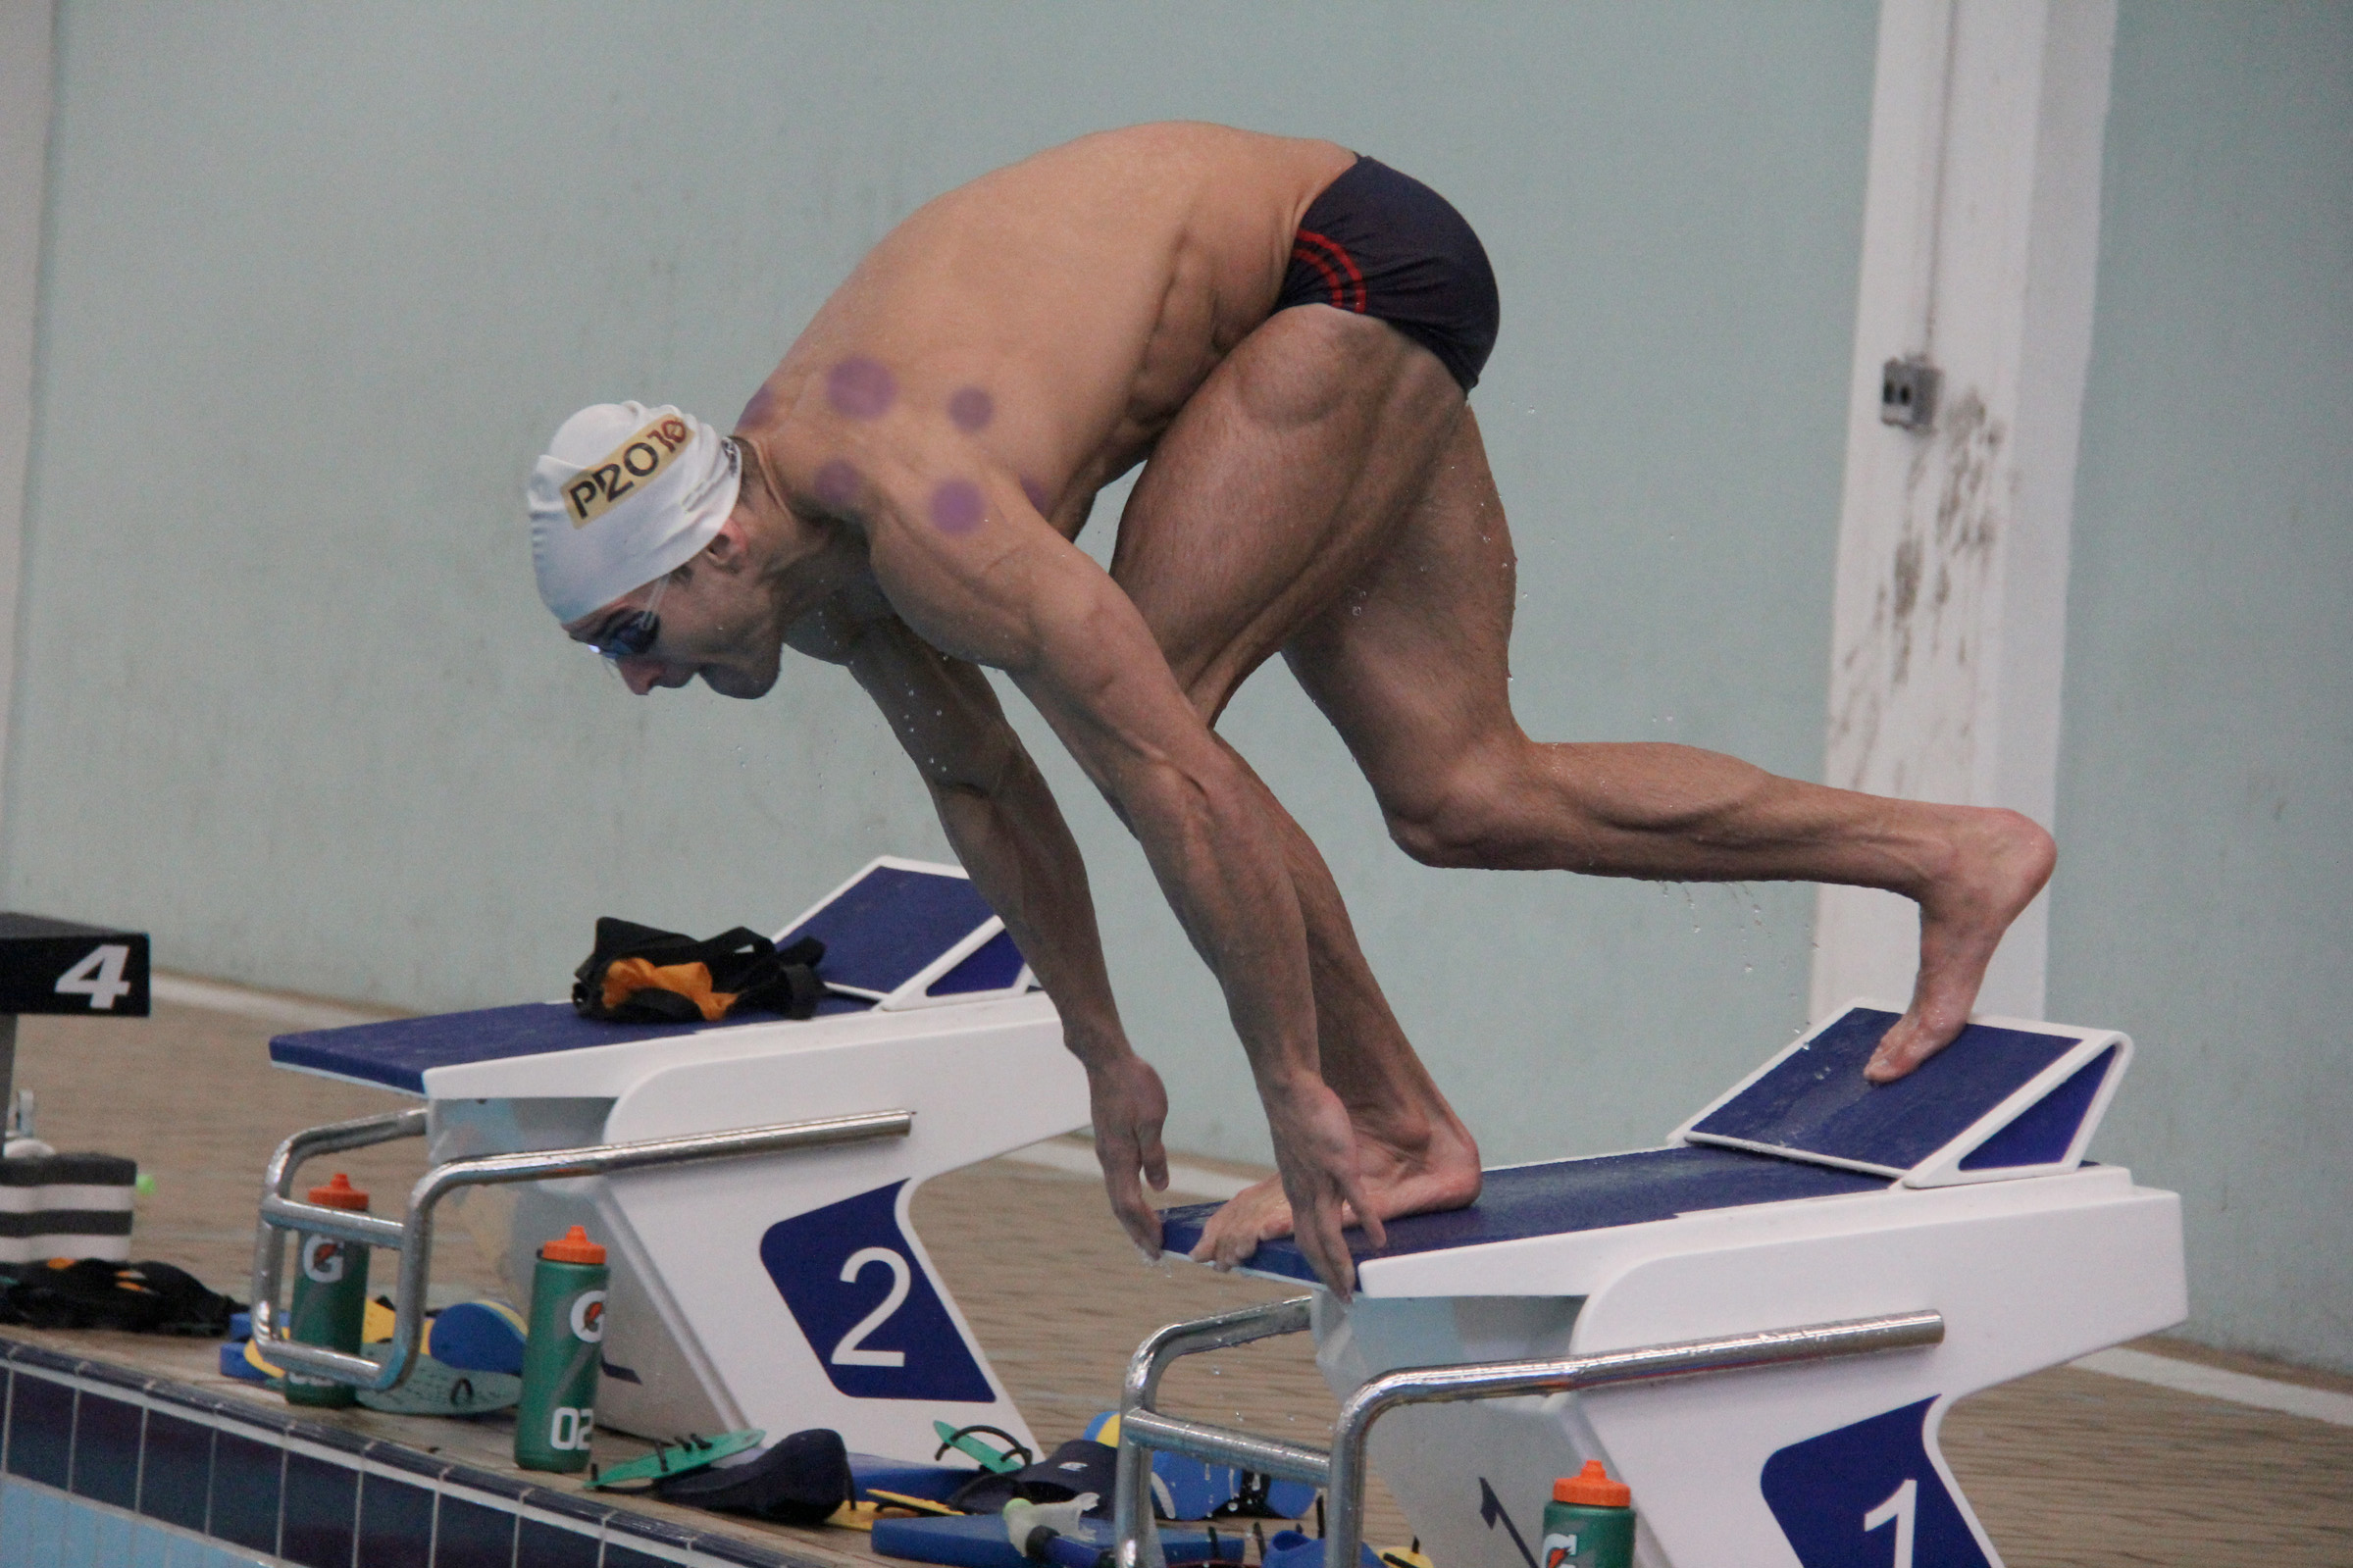 Freshman Undergoes Cupping Treatment in Preparation for Swim Test